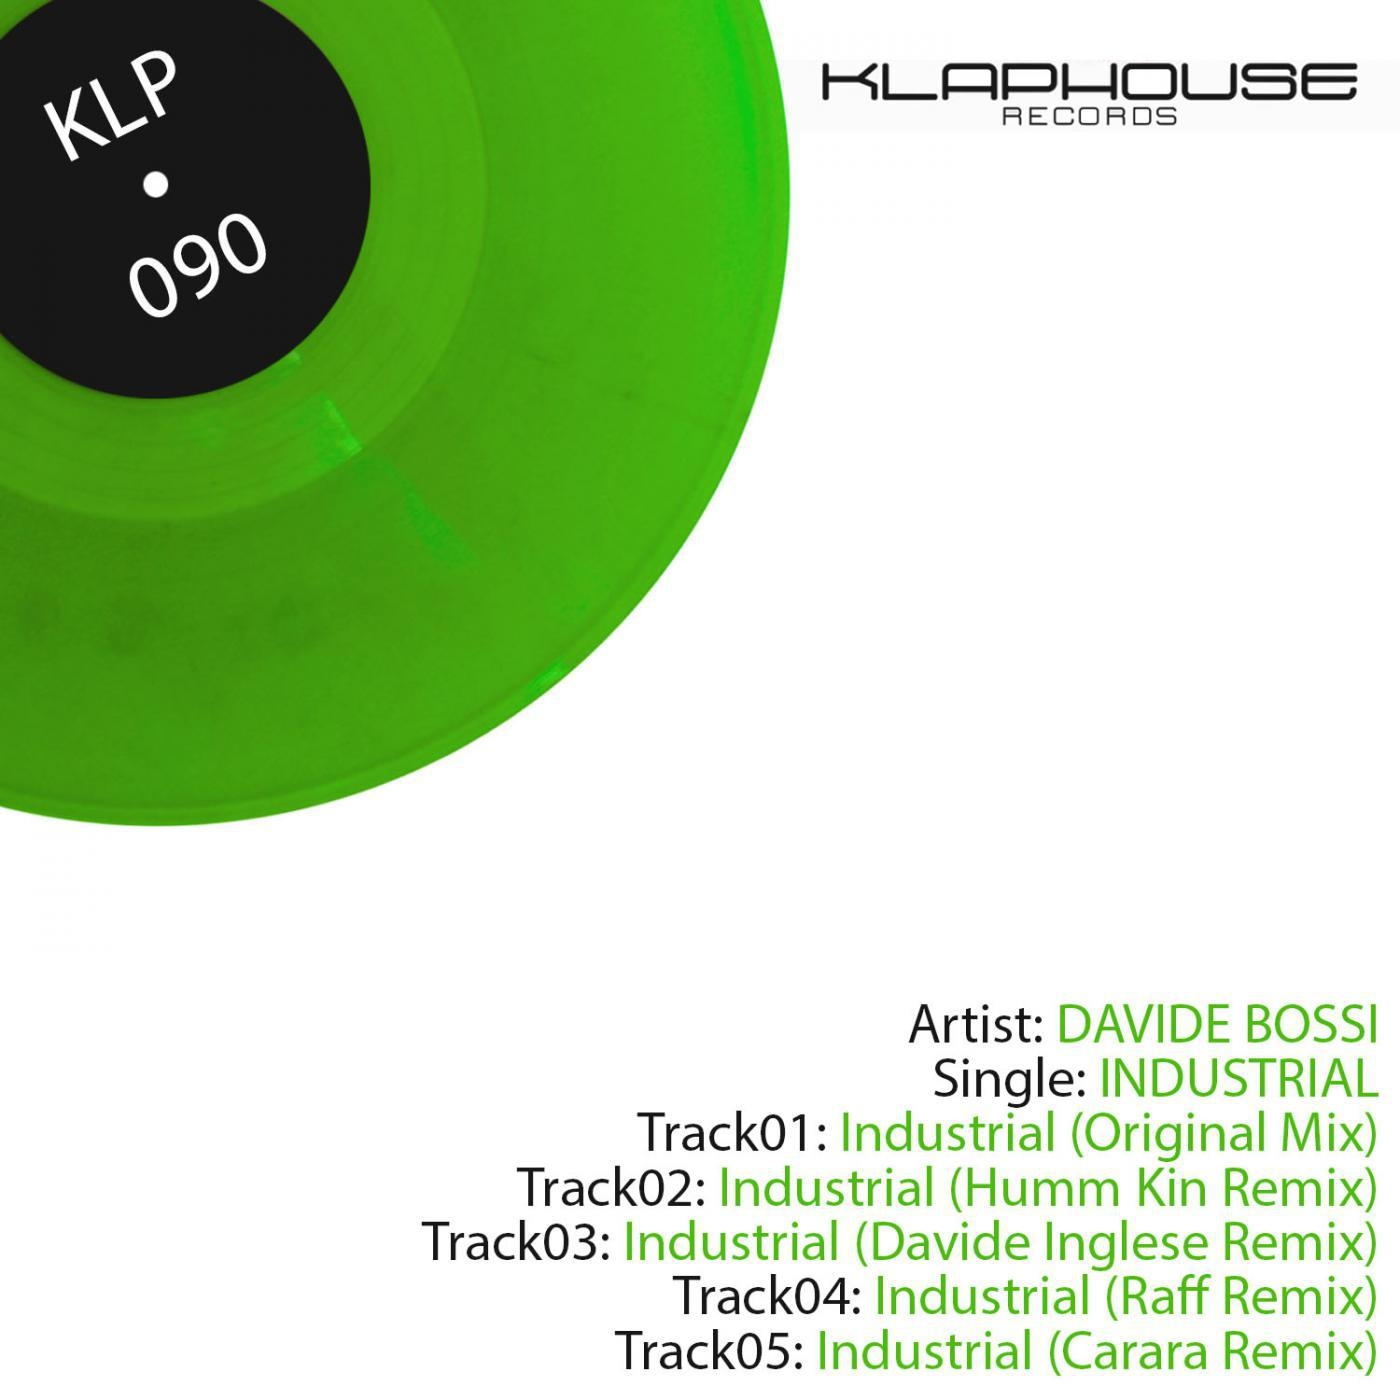 Davide Bossi - Industrial. (Davide Inglese remix)